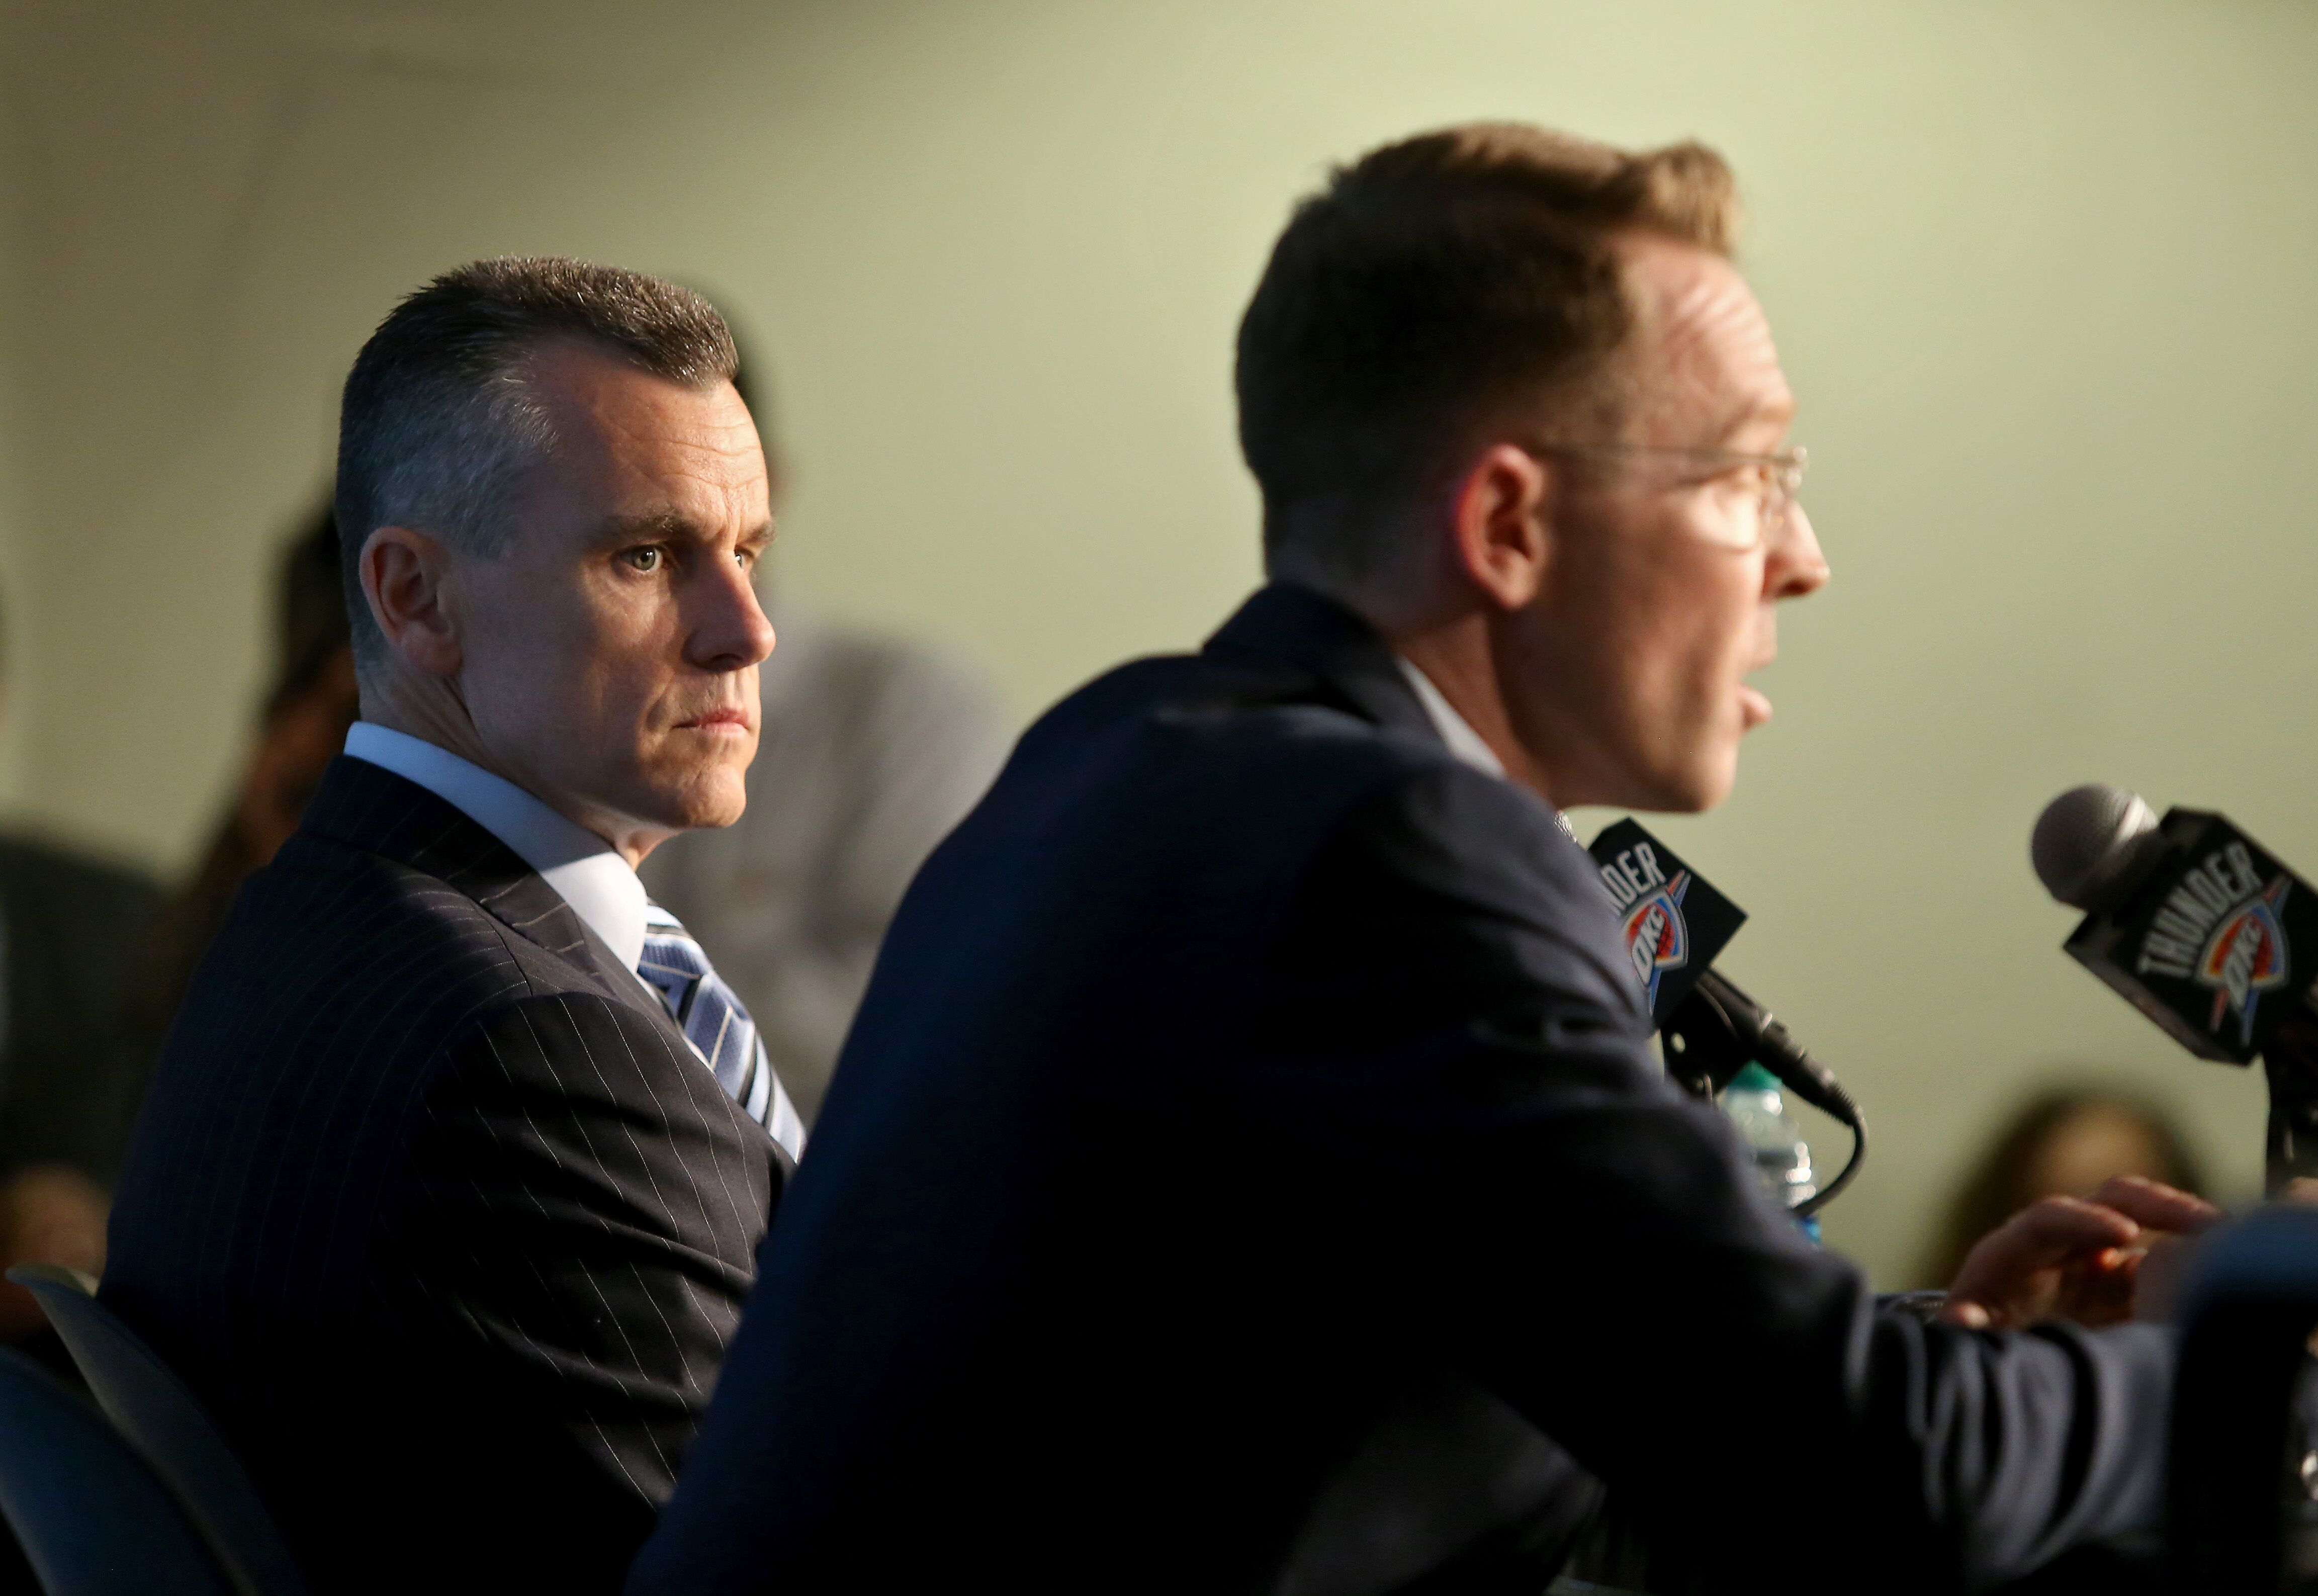 OKC Thunder and Sam Presti received death threats for trading Paul George